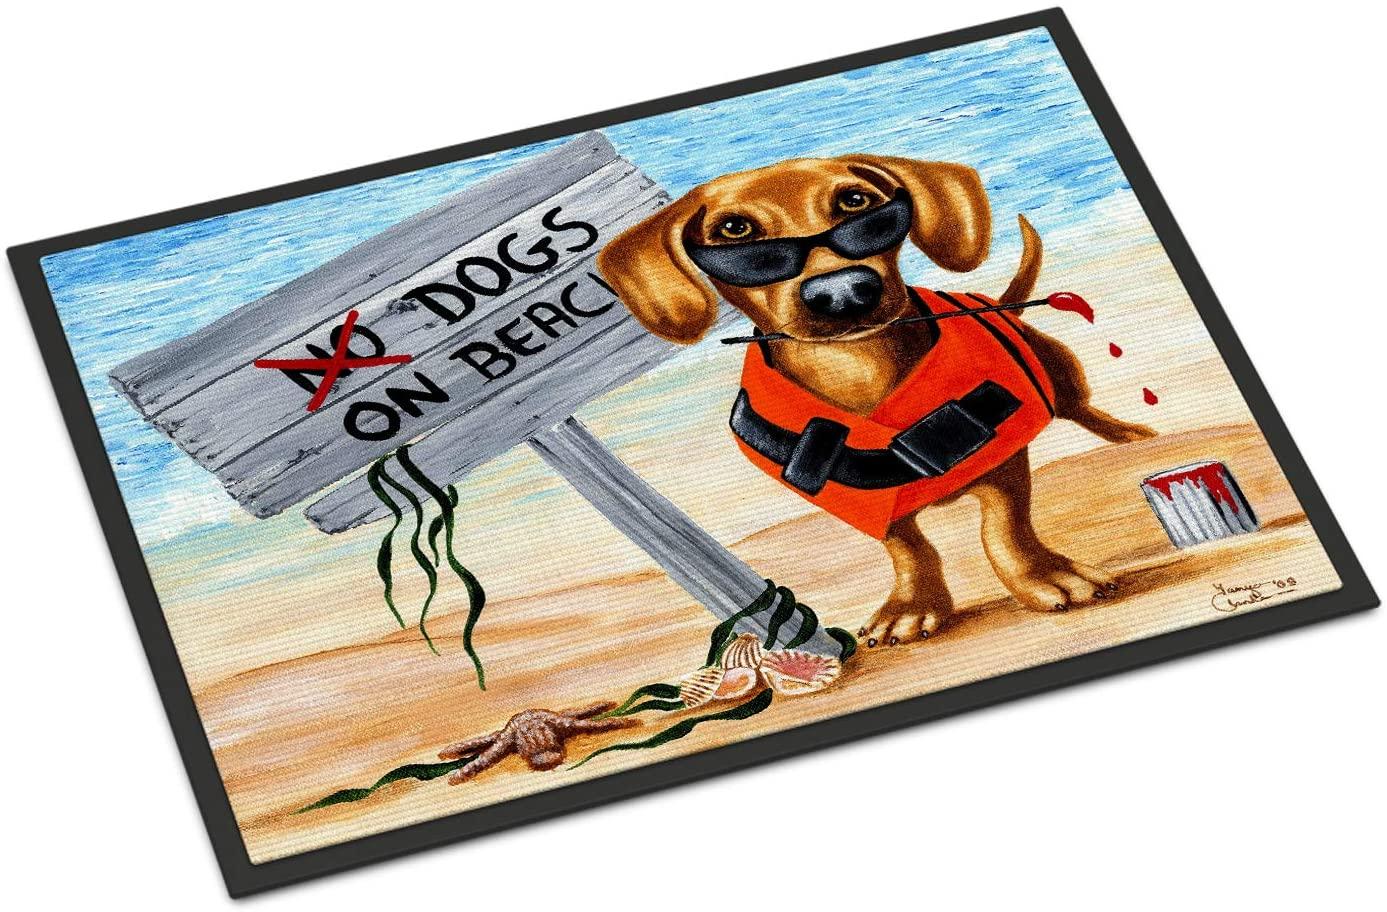 Carolines Treasures AMB1341JMAT The Dog Beach Dachshund Indoor or Outdoor Mat 24x36, 24H X 36W, Multicolor